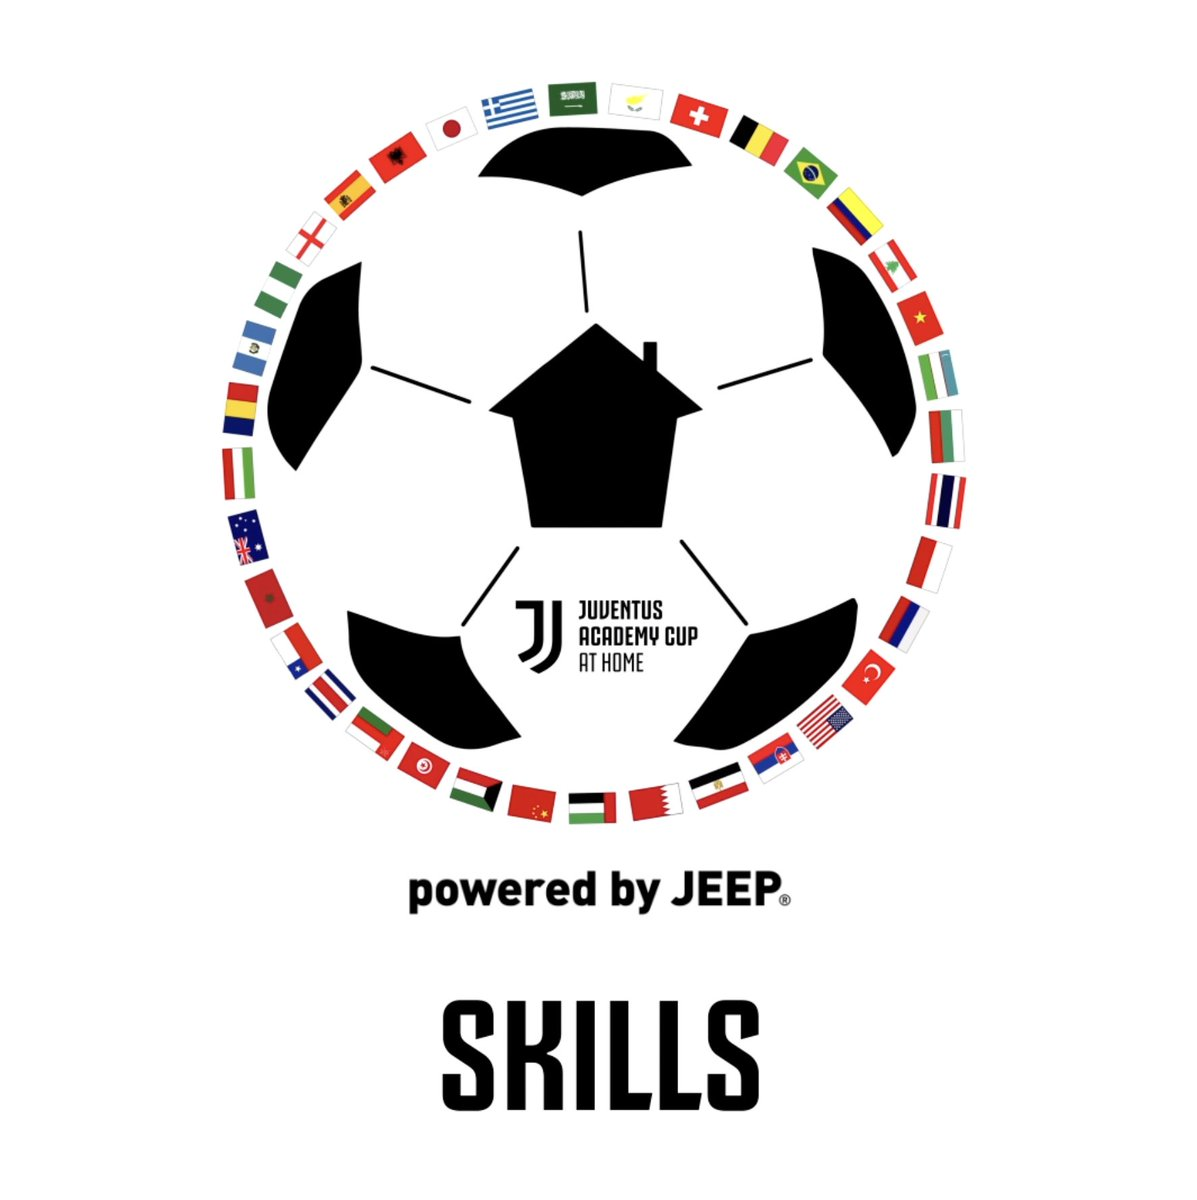 🔝 Kumpulan skill terbaik dari seluruh dunia! 🌍  #JuventusAcademy Cup di🏠, didukung oleh @Jeep_People  https://t.co/Xu5CiIiwxE